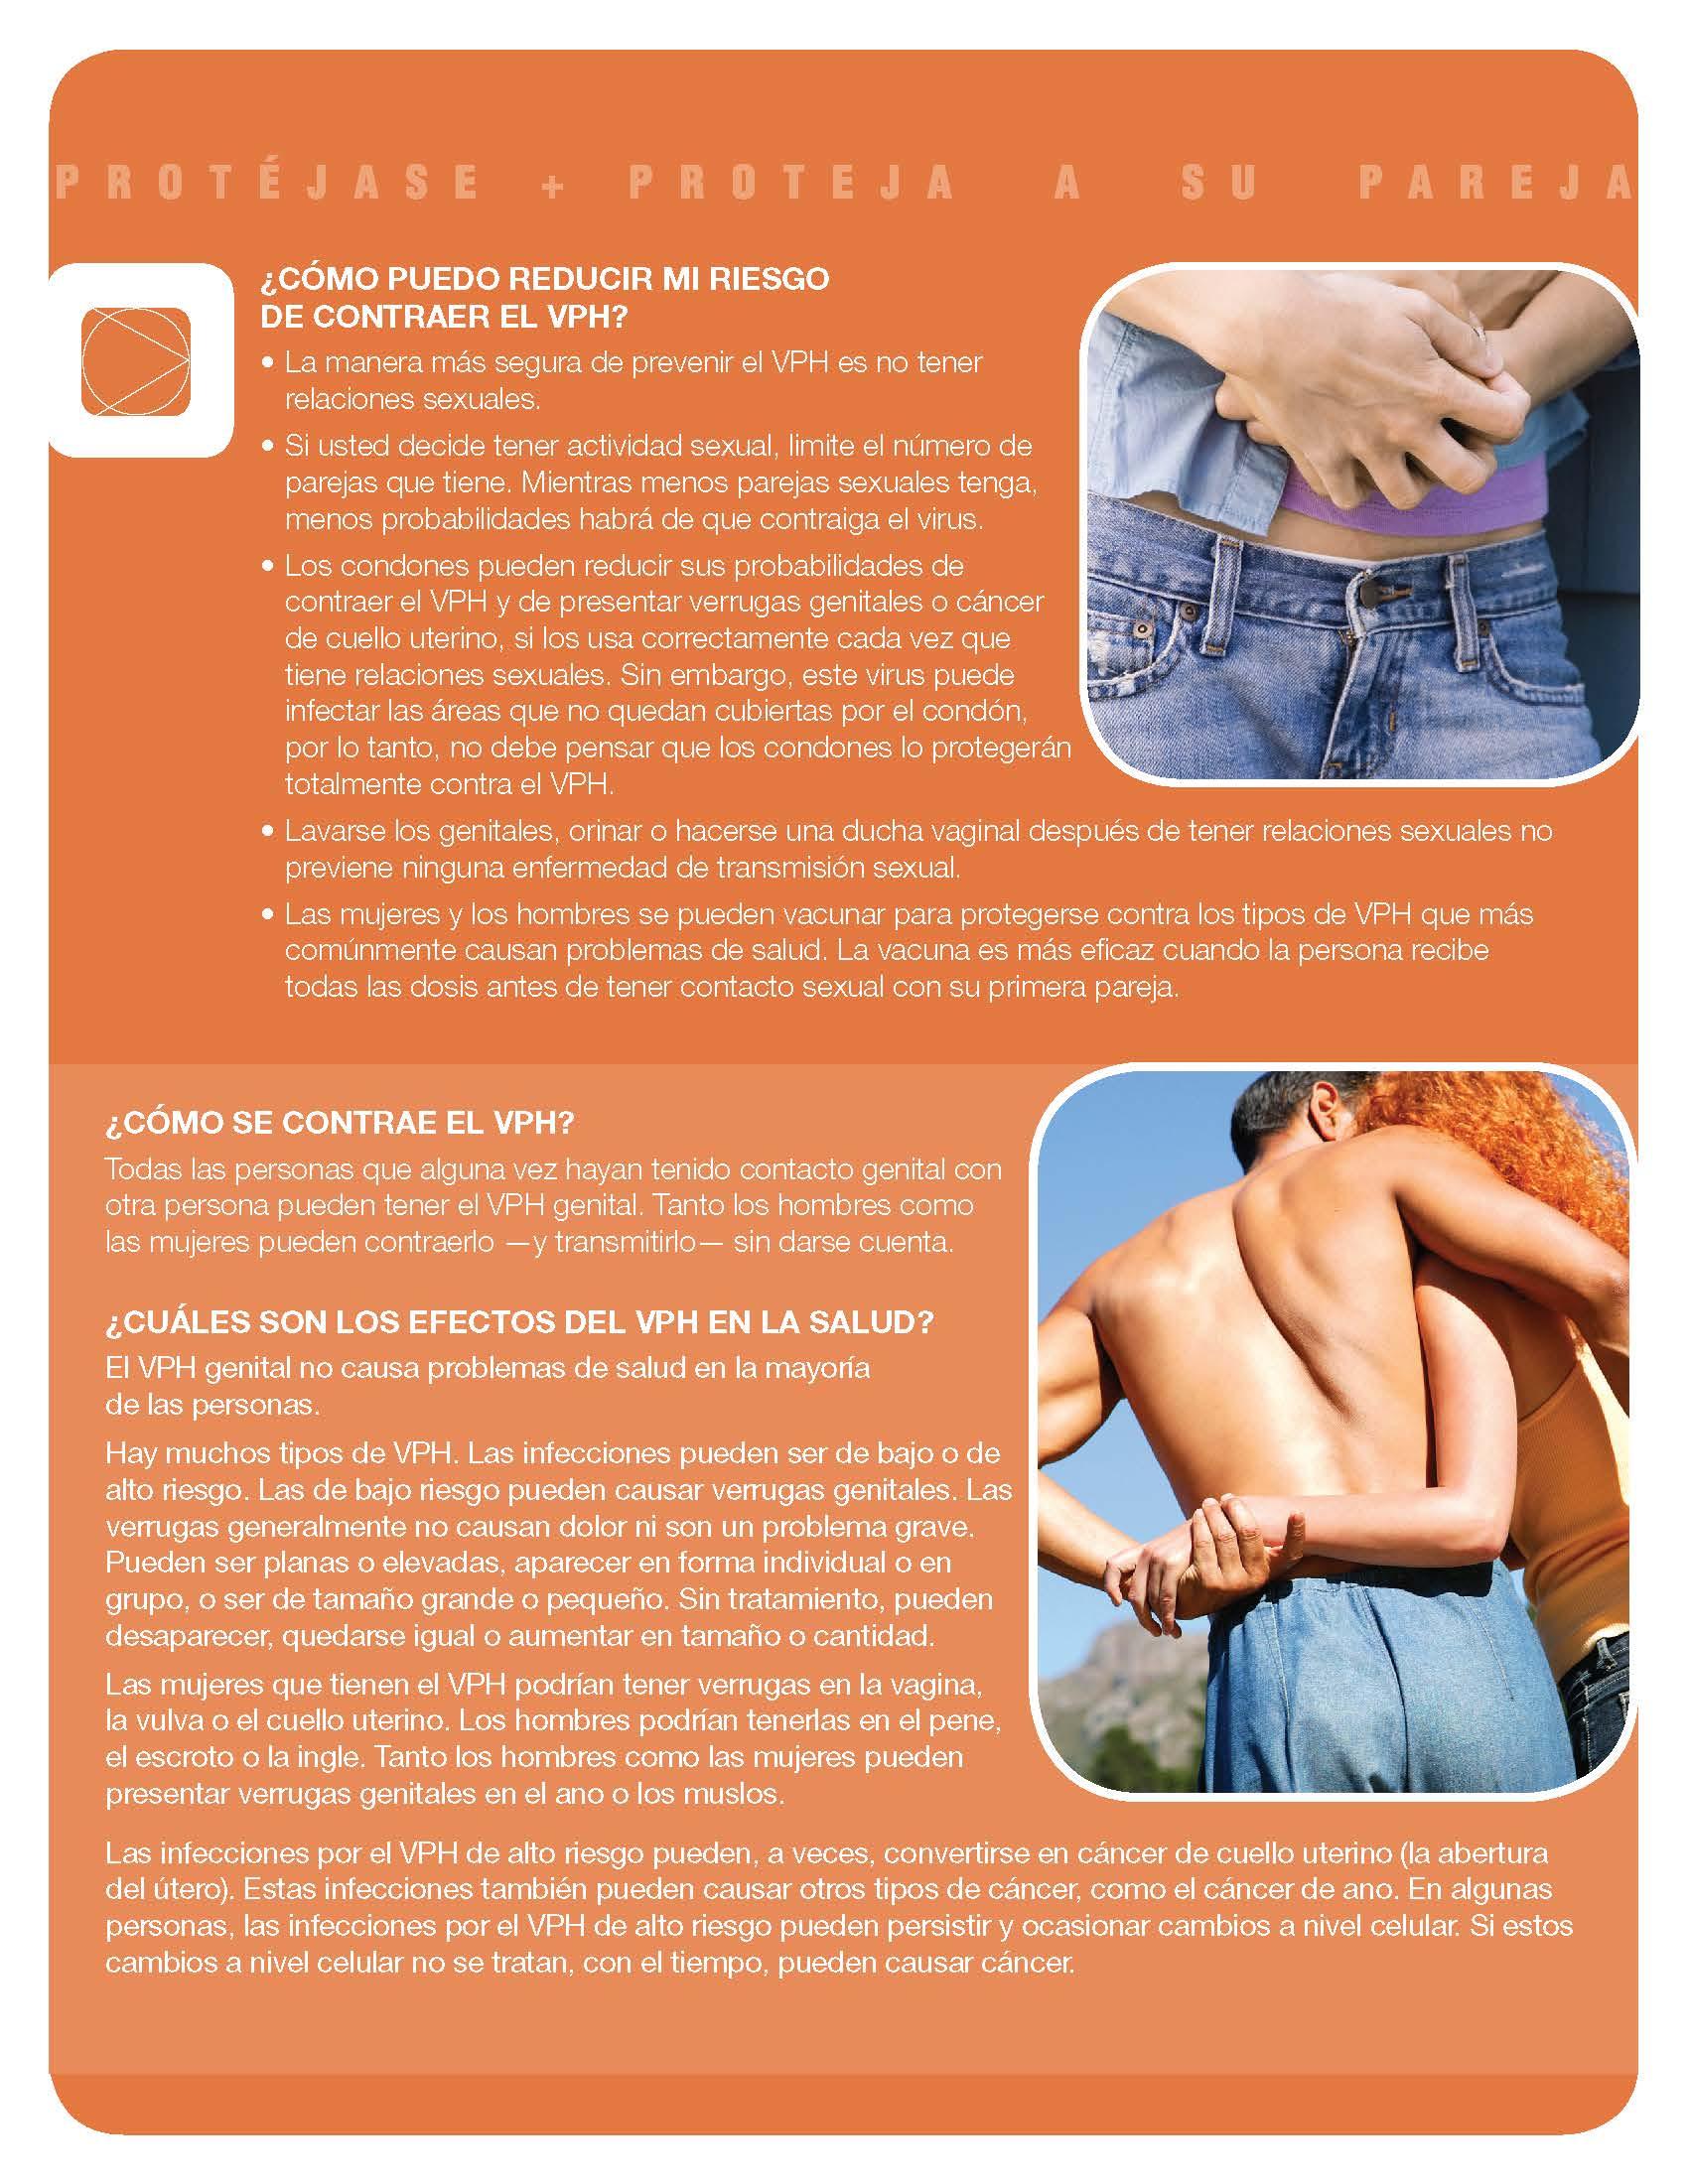 papilloma lesion in breast virus hpv en hombres sintomas